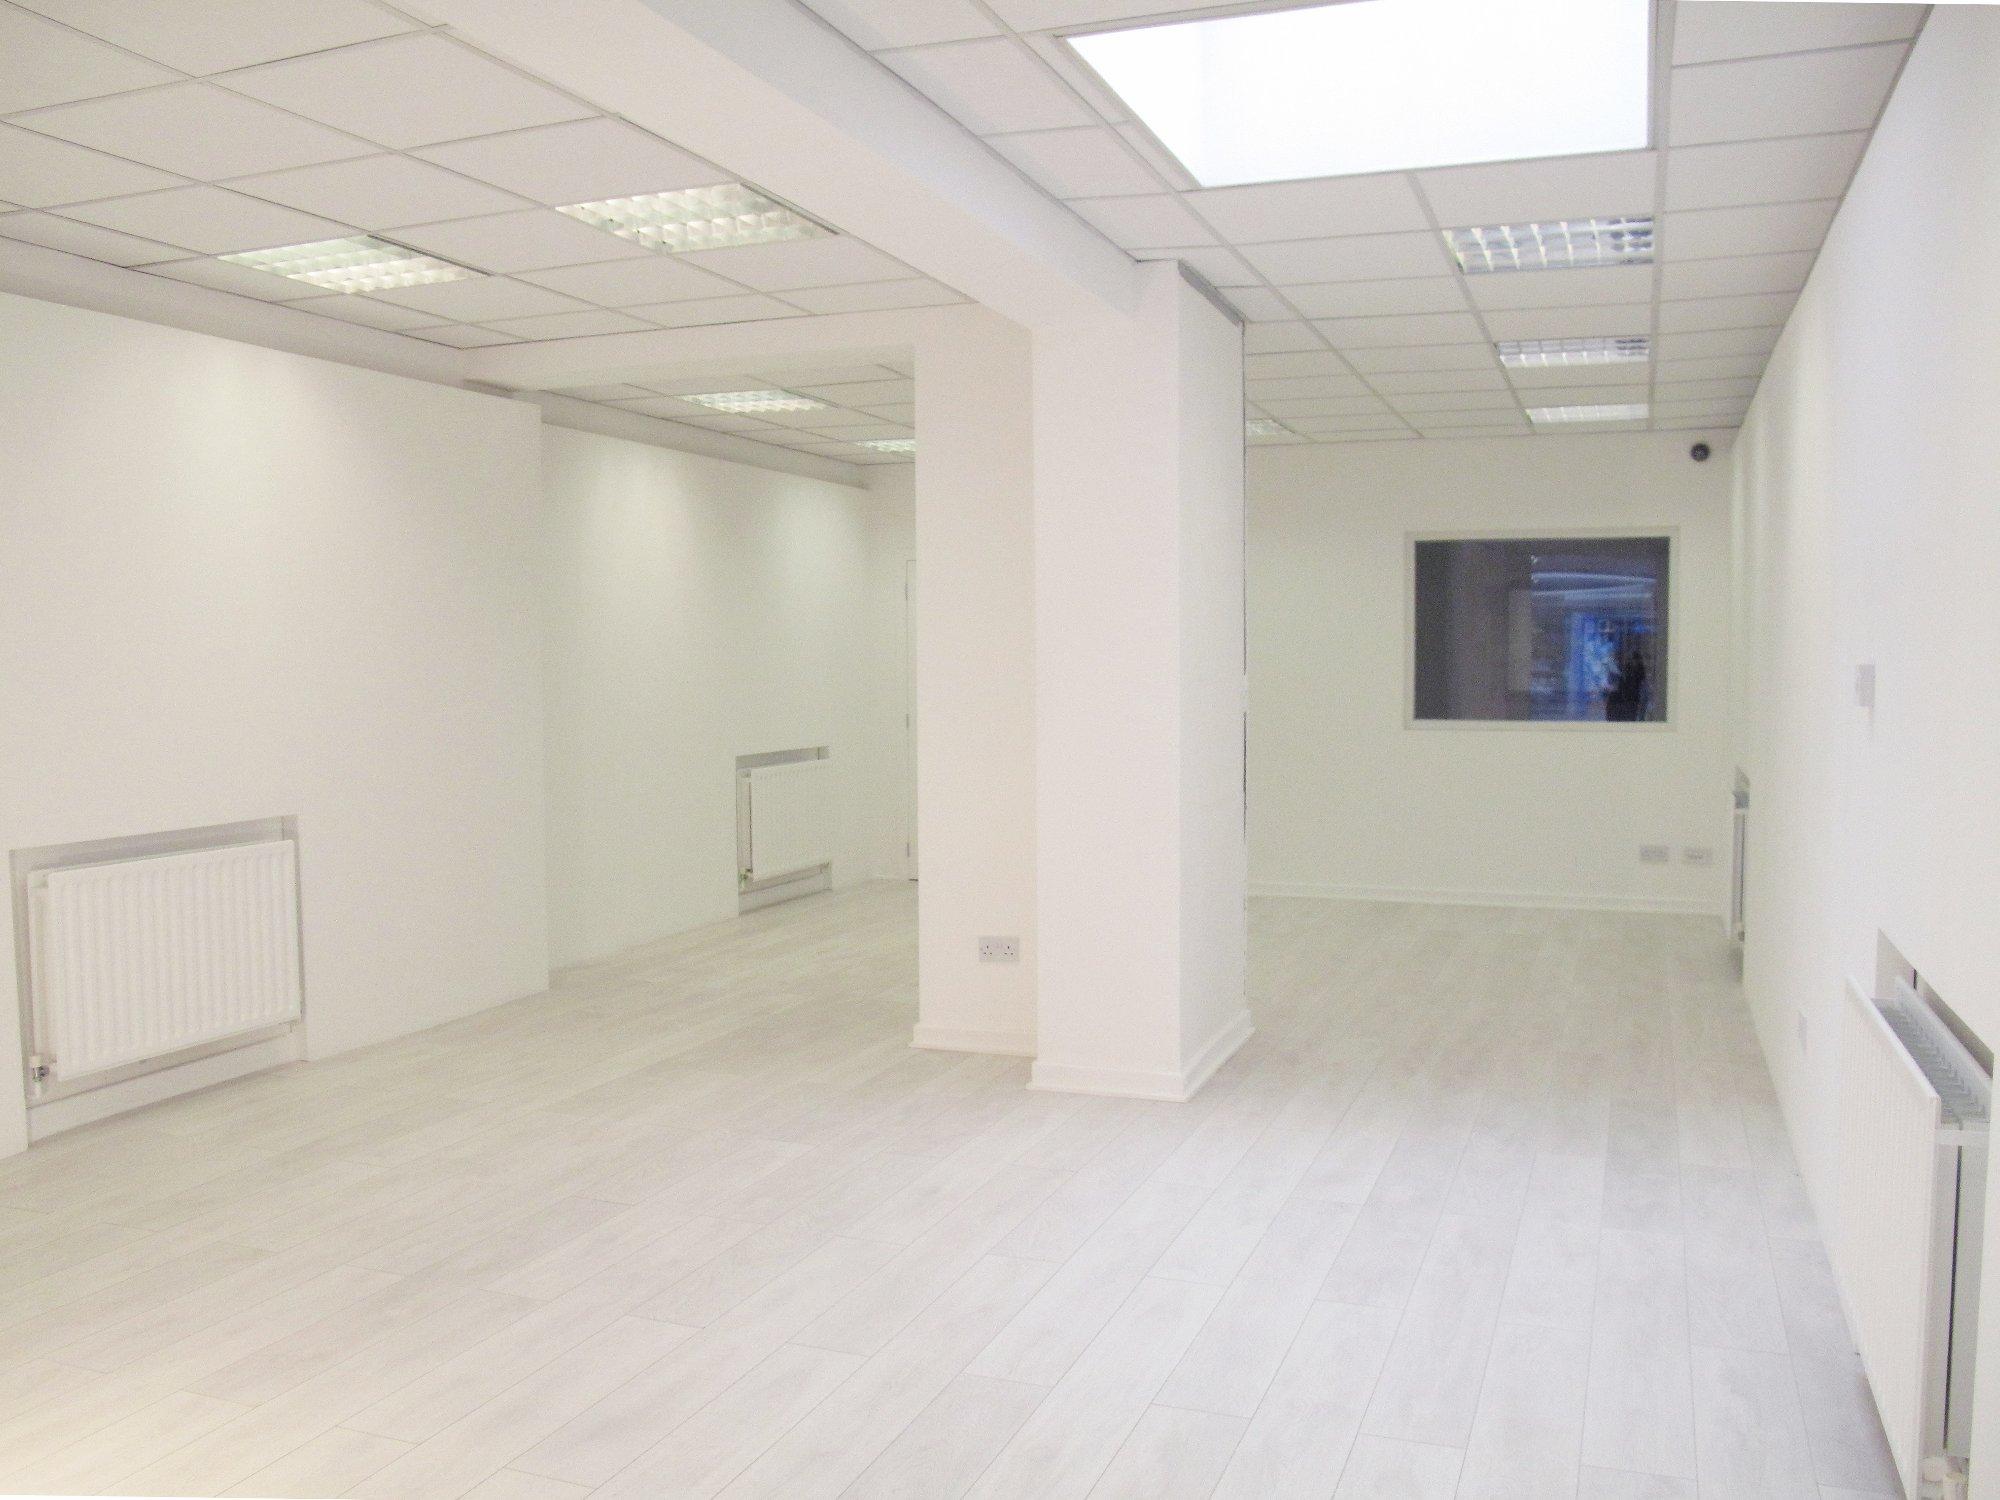 06 - Offshoot Gallery - Back.JPG